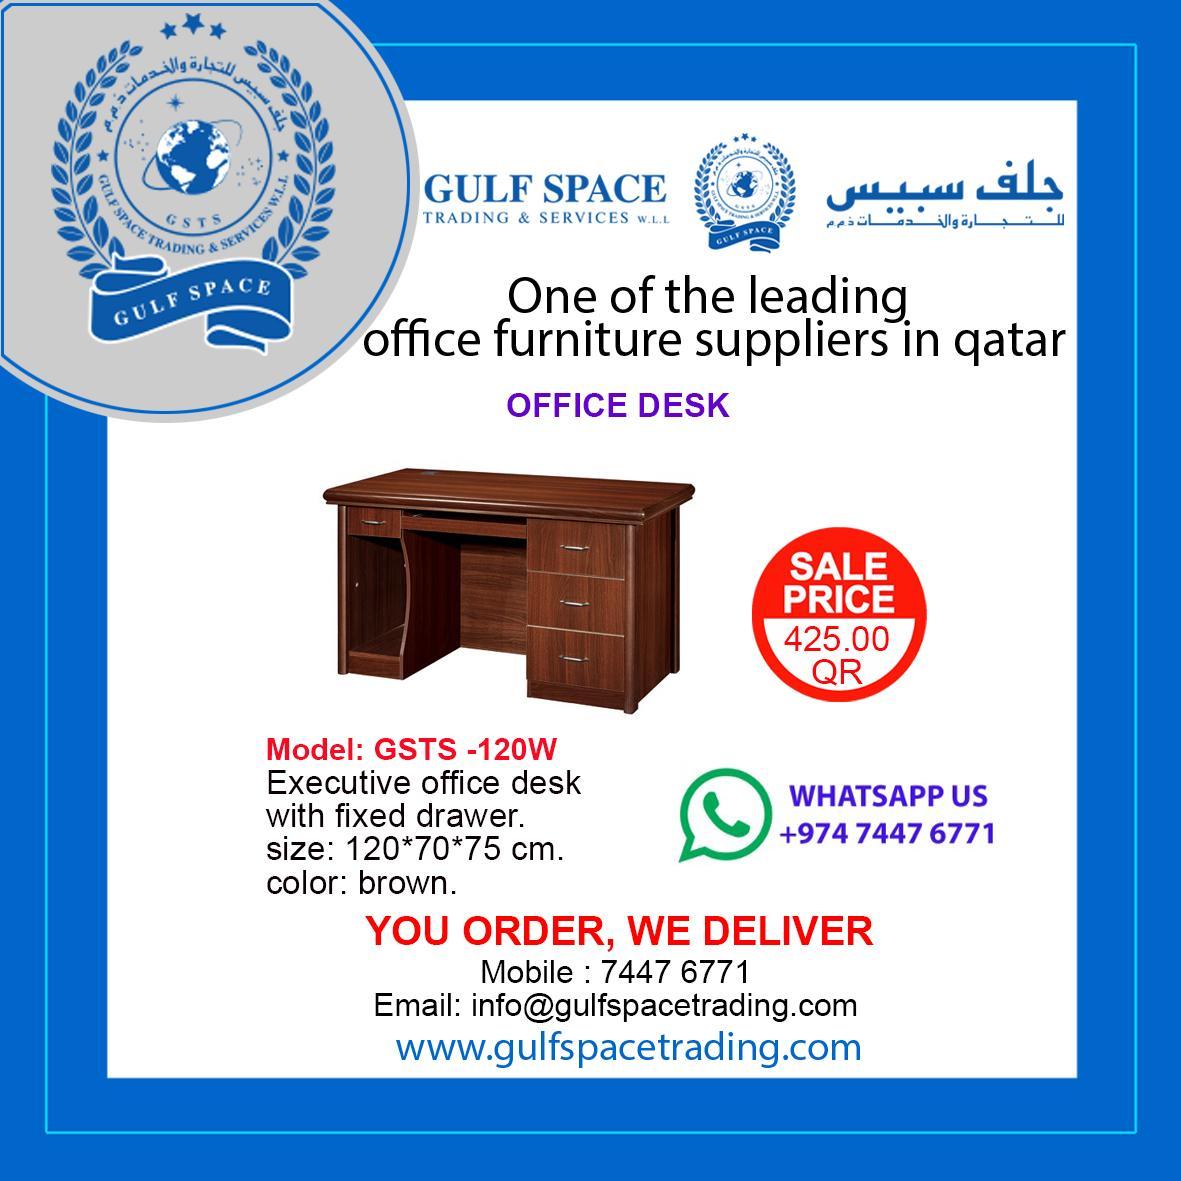 OFFICE DESKs BRAND NEW (SPECIAL PROMOTION )